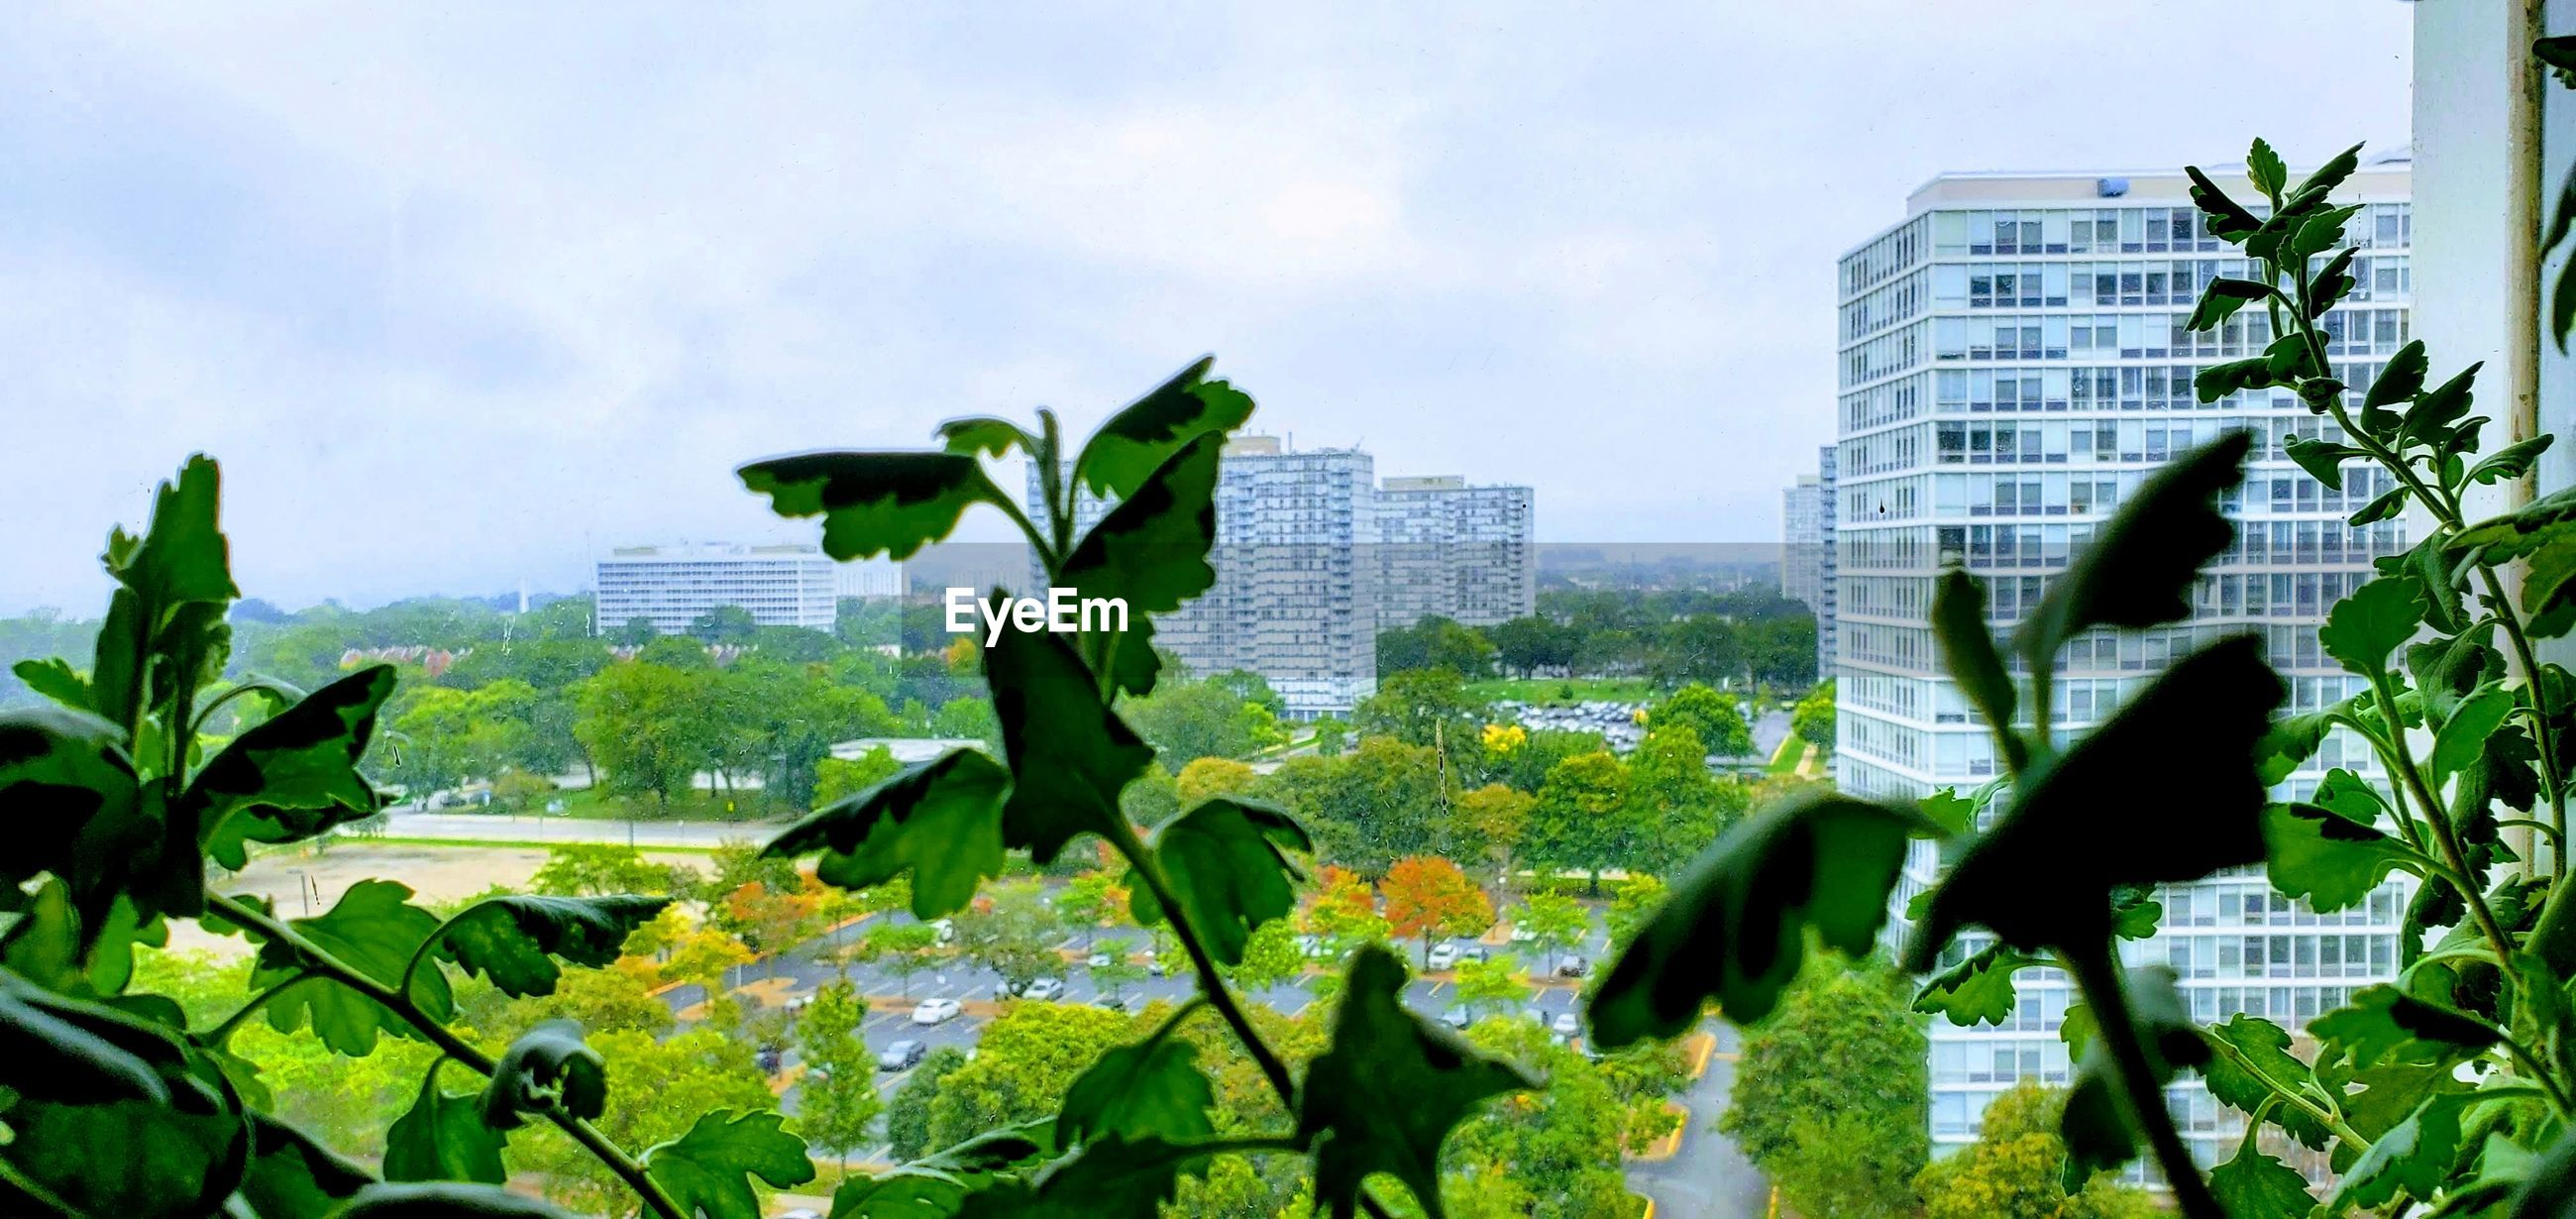 PLANTS AGAINST BUILDINGS IN CITY